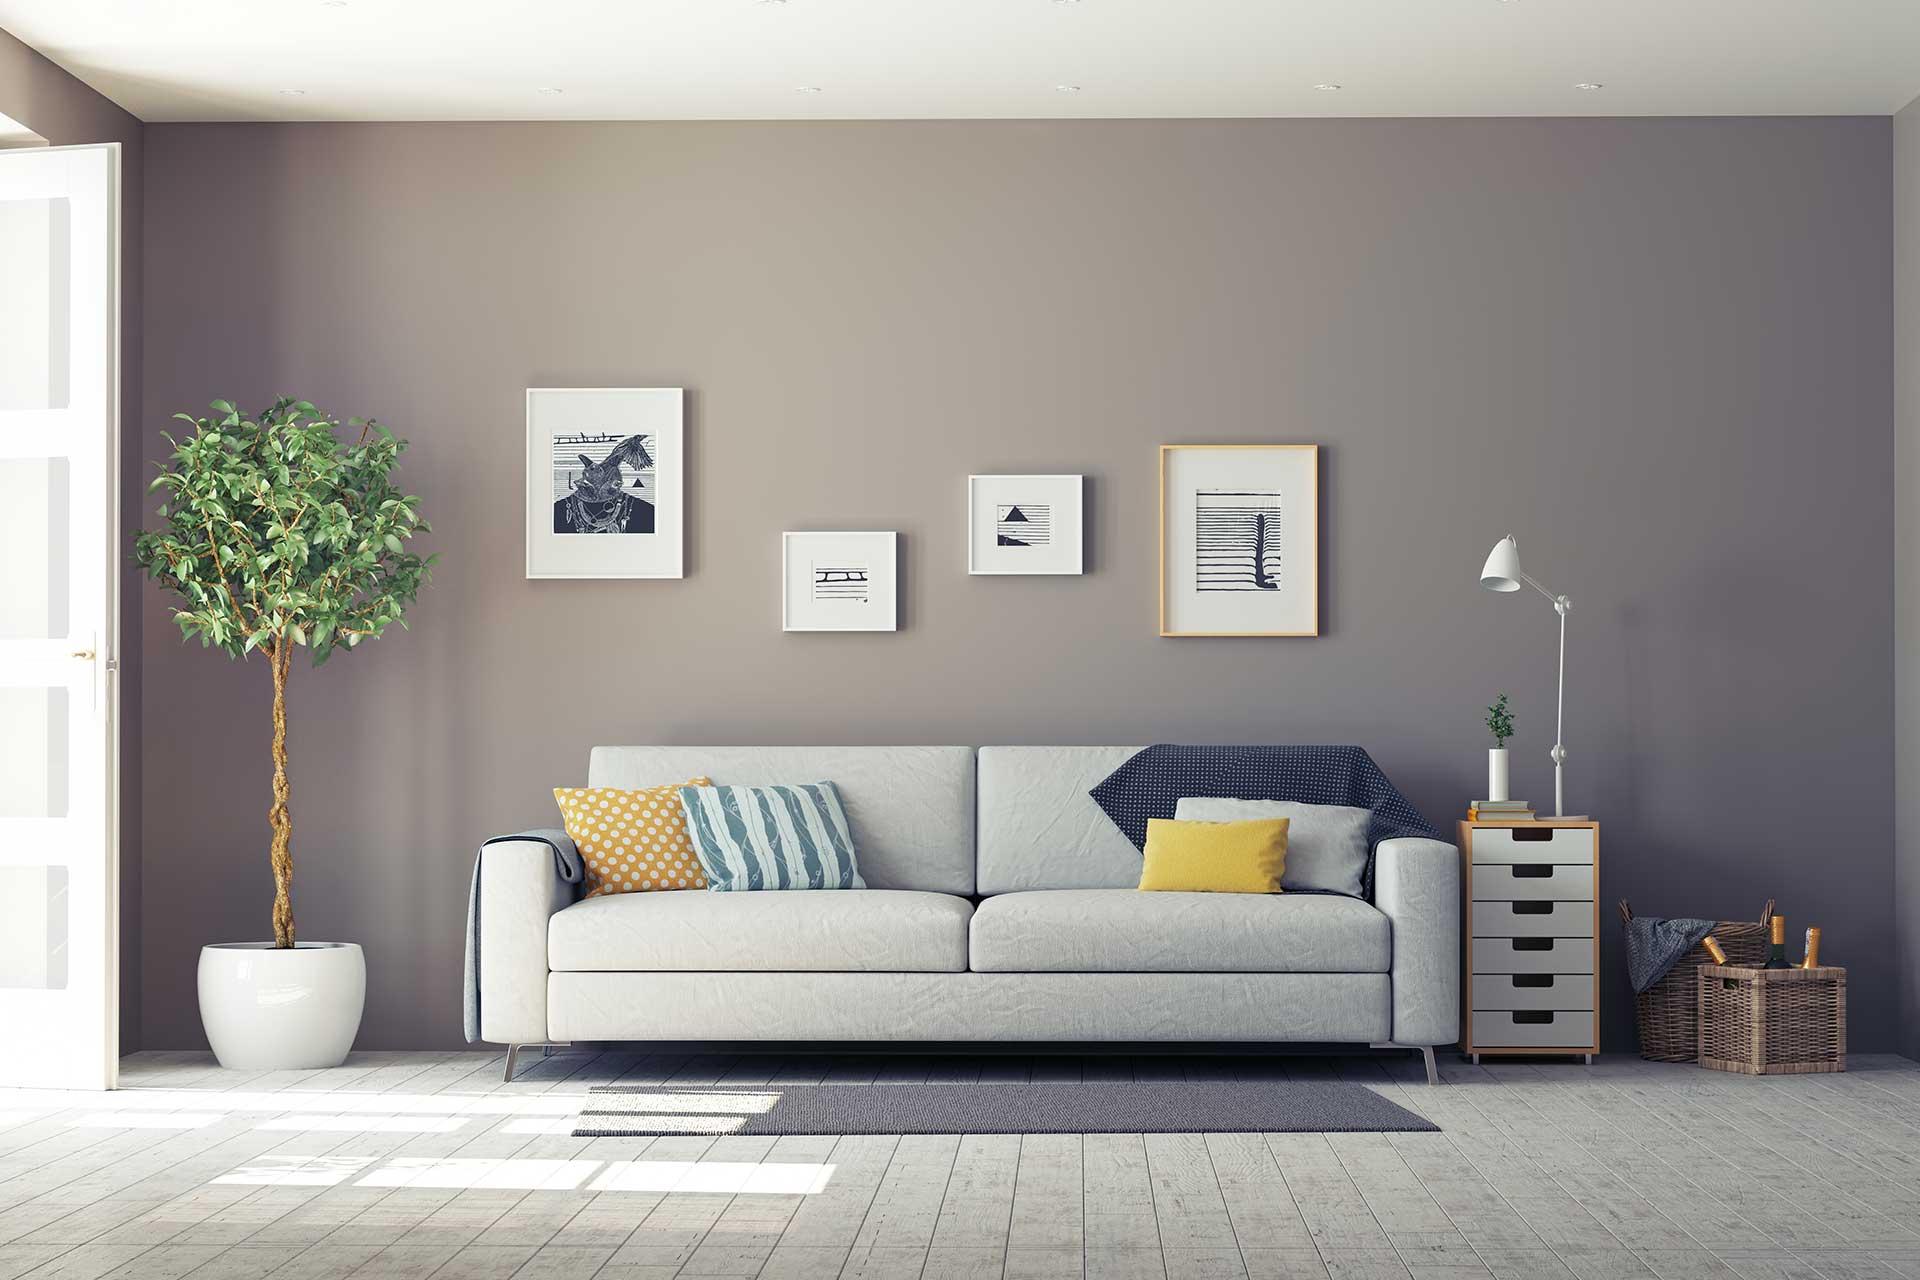 Repainting Your Living Room | Blog | Arizona Painting Company